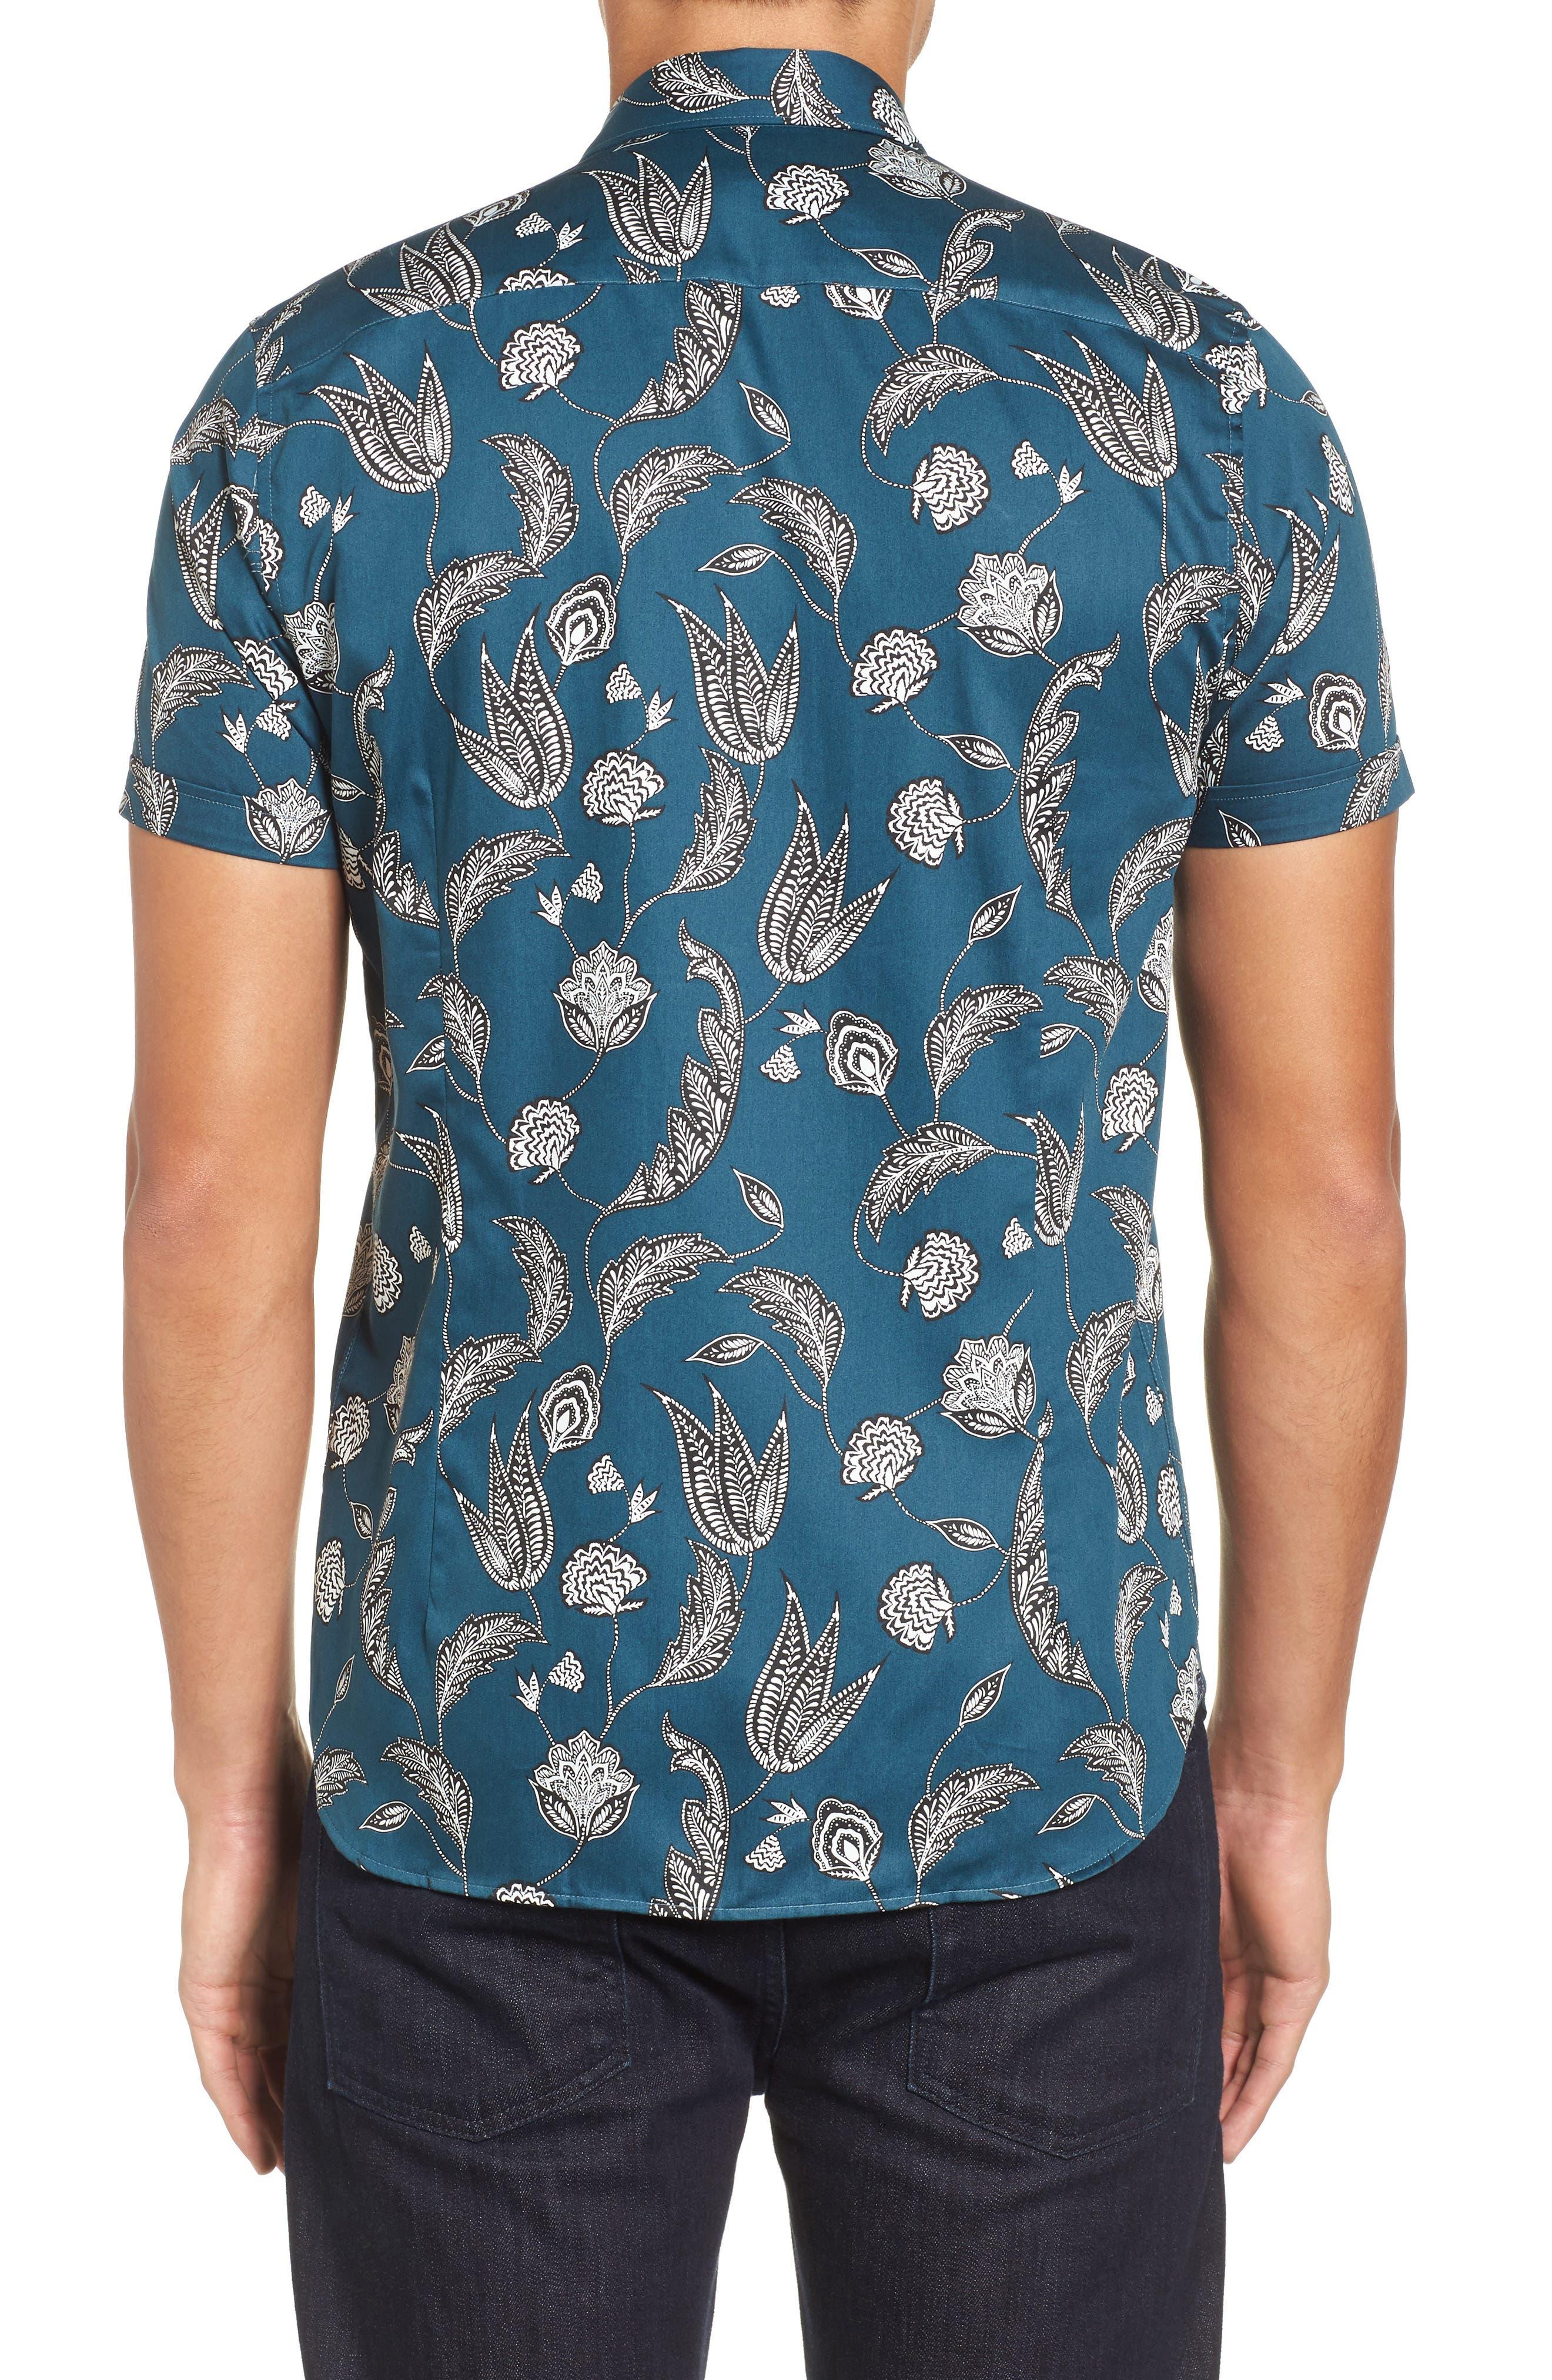 UTKU Floral Sport Shirt,                             Alternate thumbnail 2, color,                             Dark Green